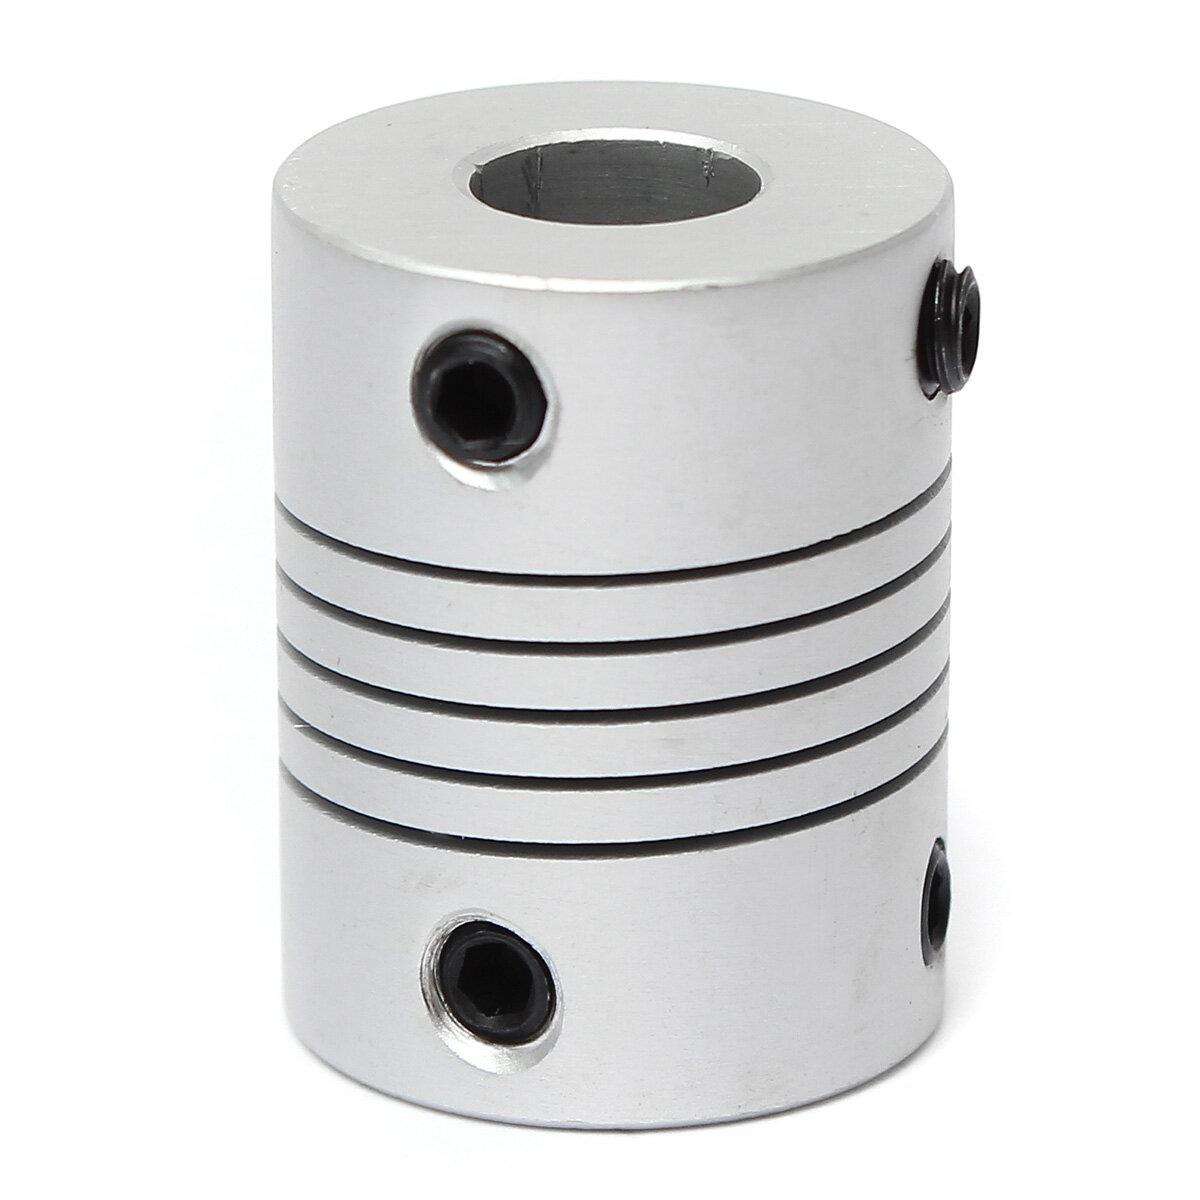 Aluminum Flexible Shaft Coupler Coupling 5mm to 8mm